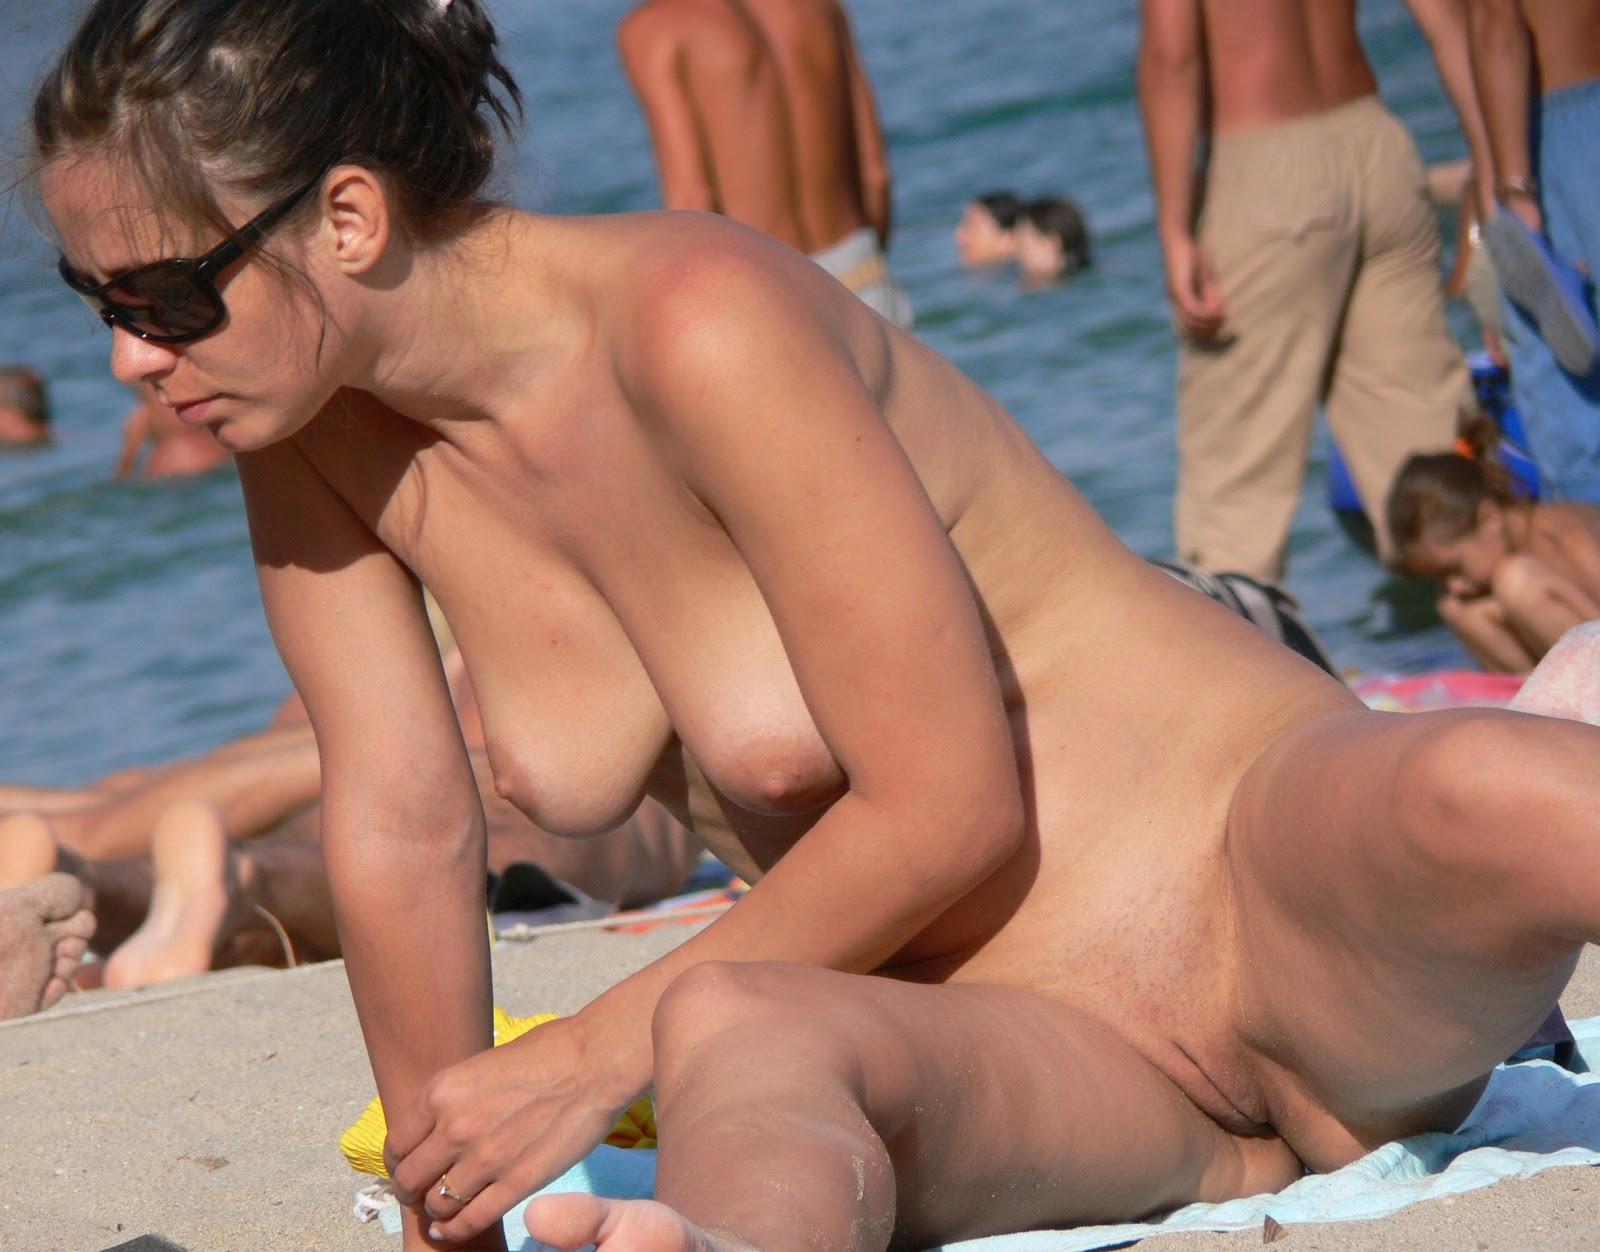 Voyeur fucks hot milf on the beach